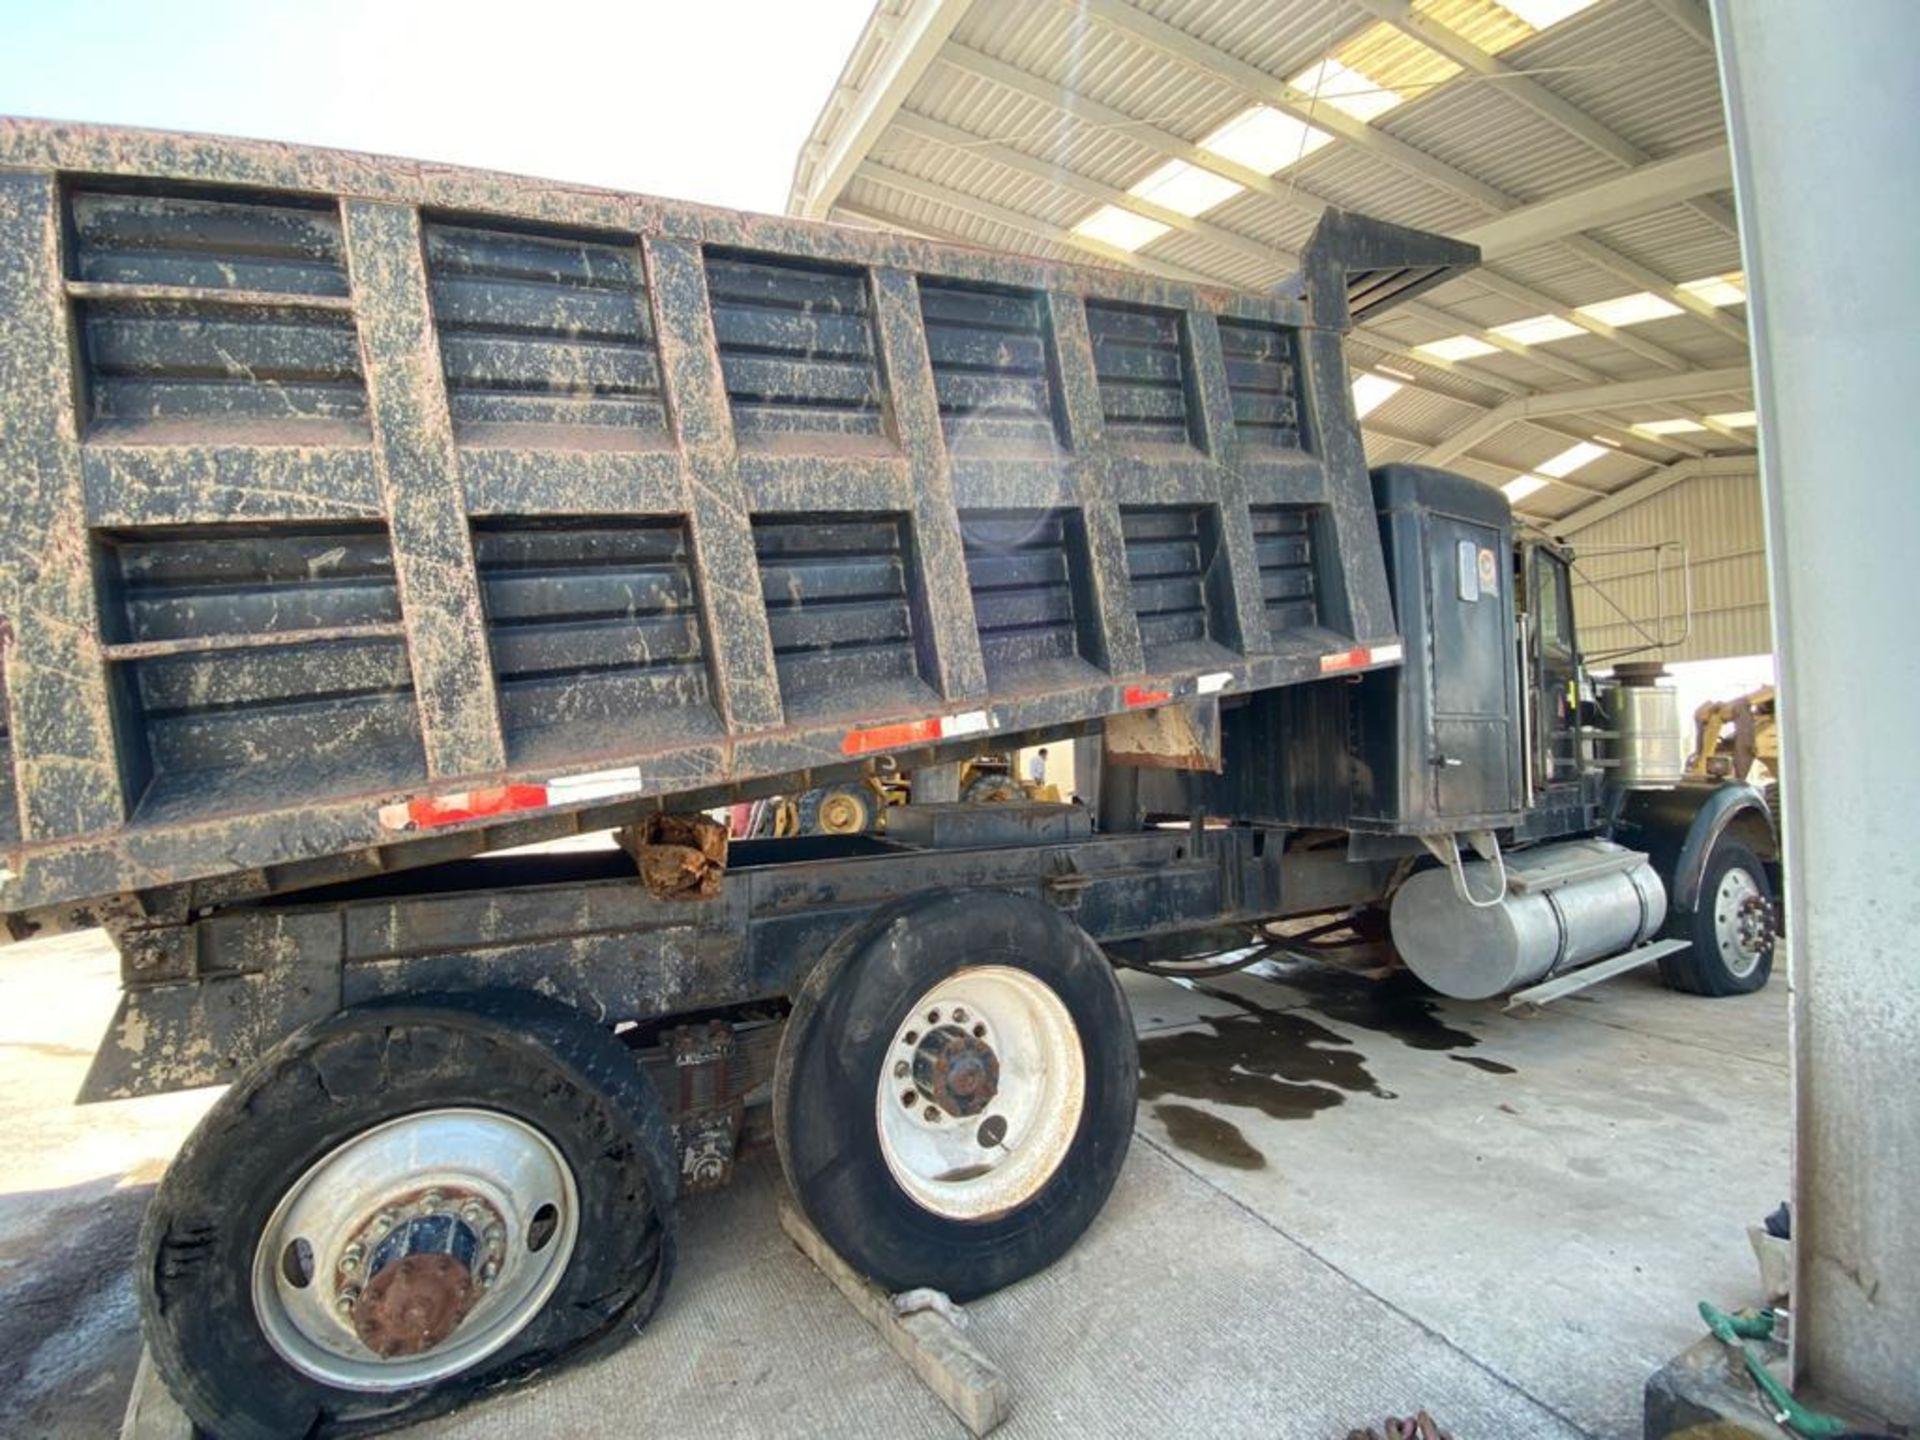 1983 Kenworth Dump Truck, standard transmission of 10 speeds, with Cummins motor - Image 15 of 68